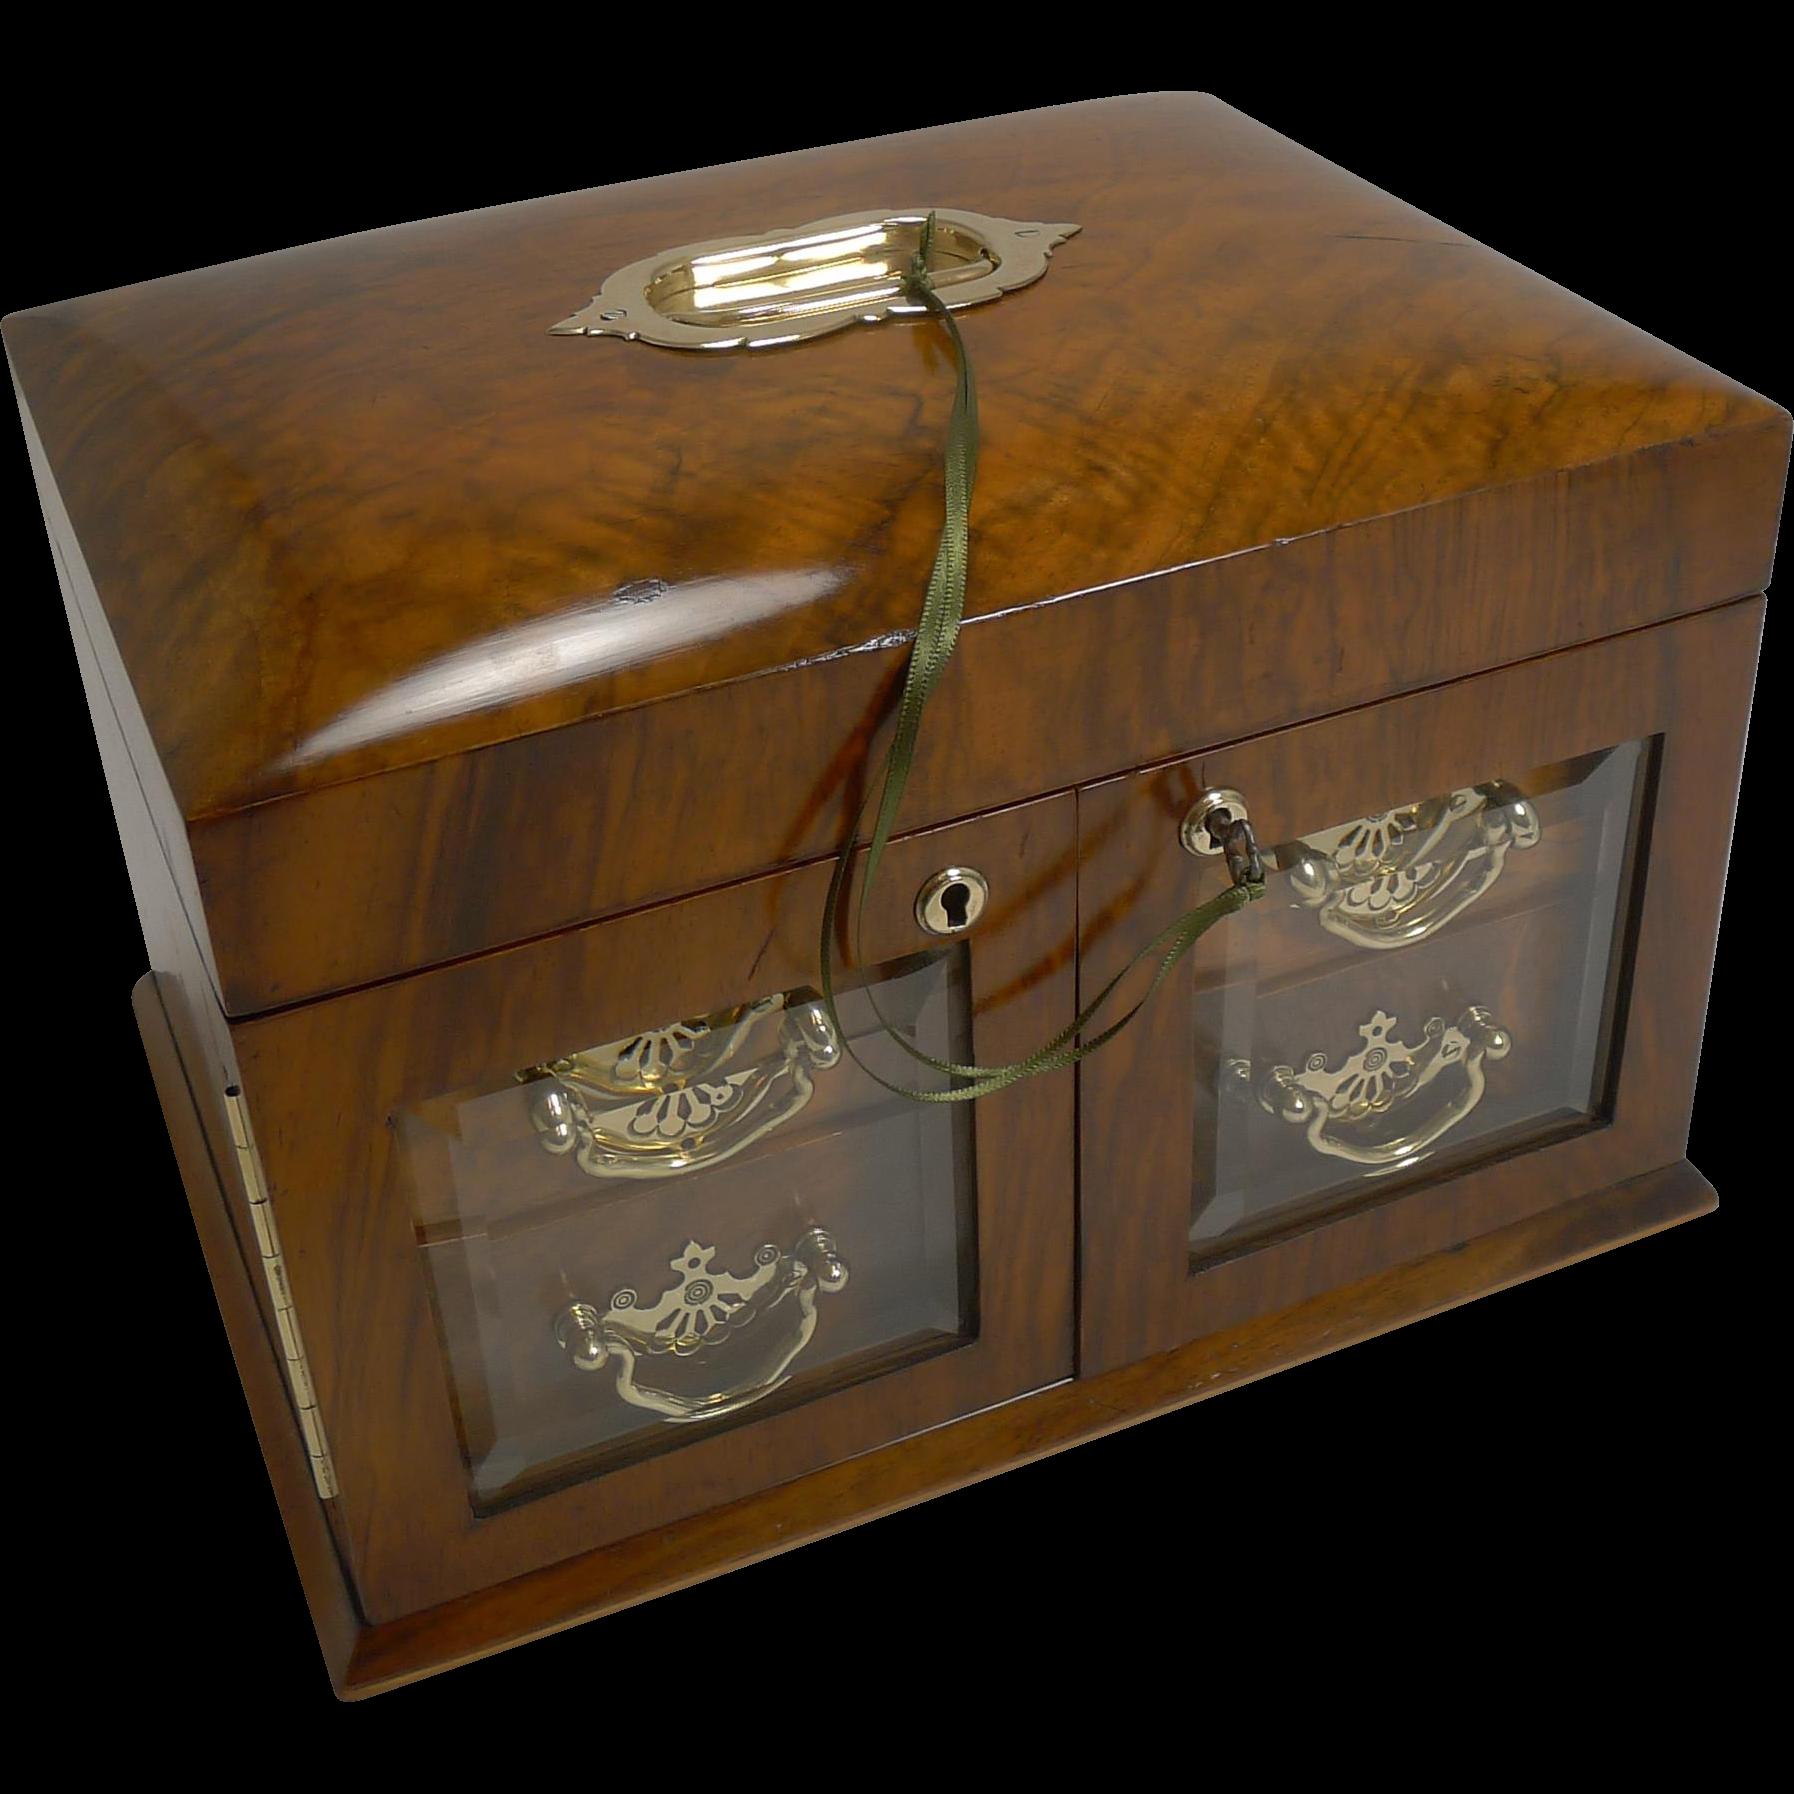 Large Antique English Walnut Jewellery Box / Cabinet - Bevelled Glass Doors c.1890